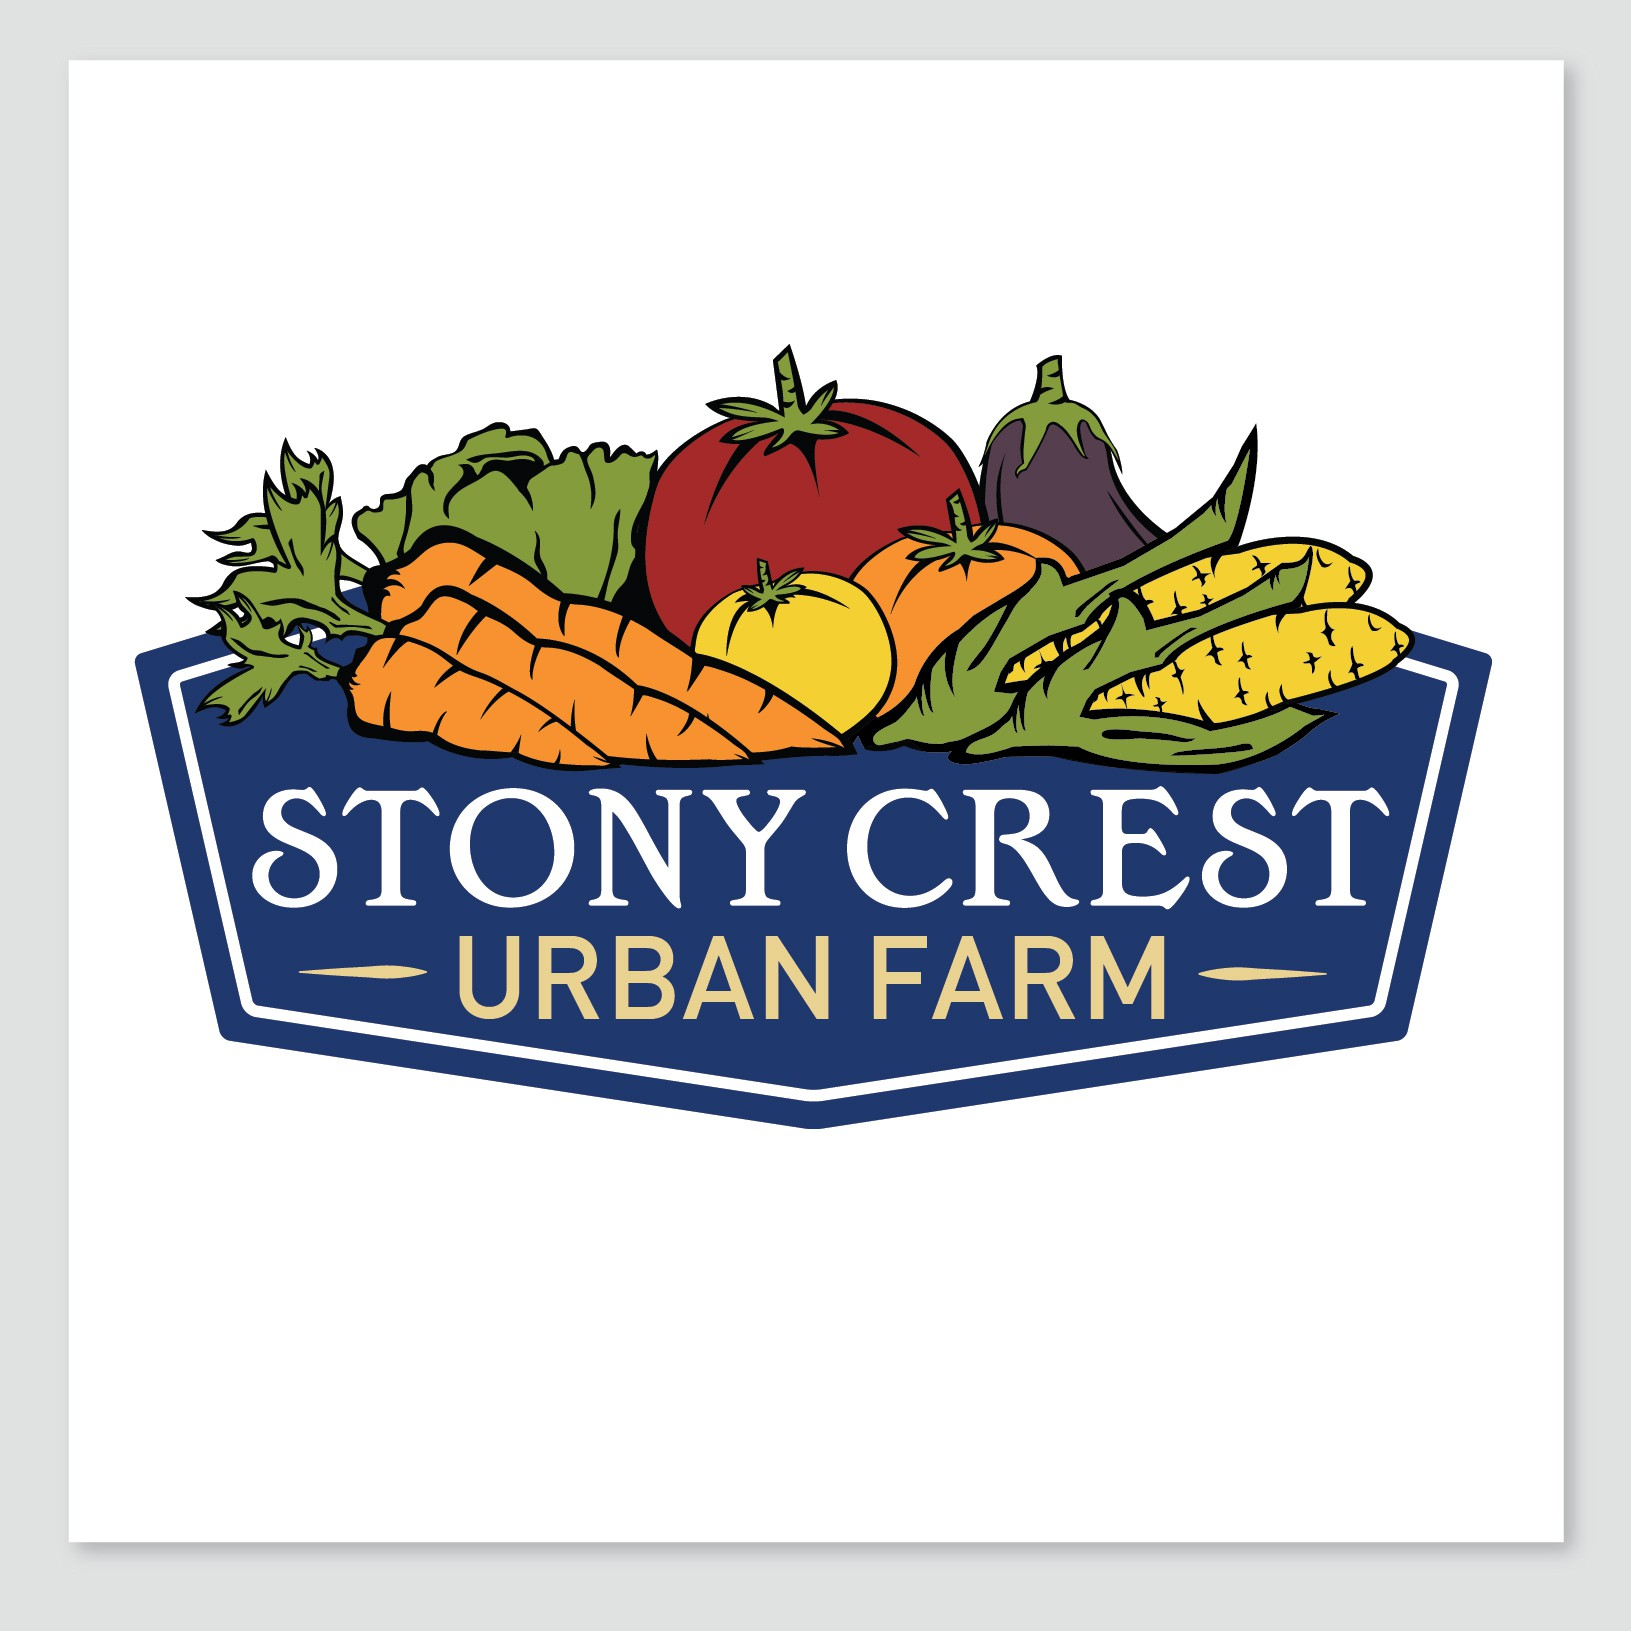 Create the next logo for Stony Crest Urban Farm